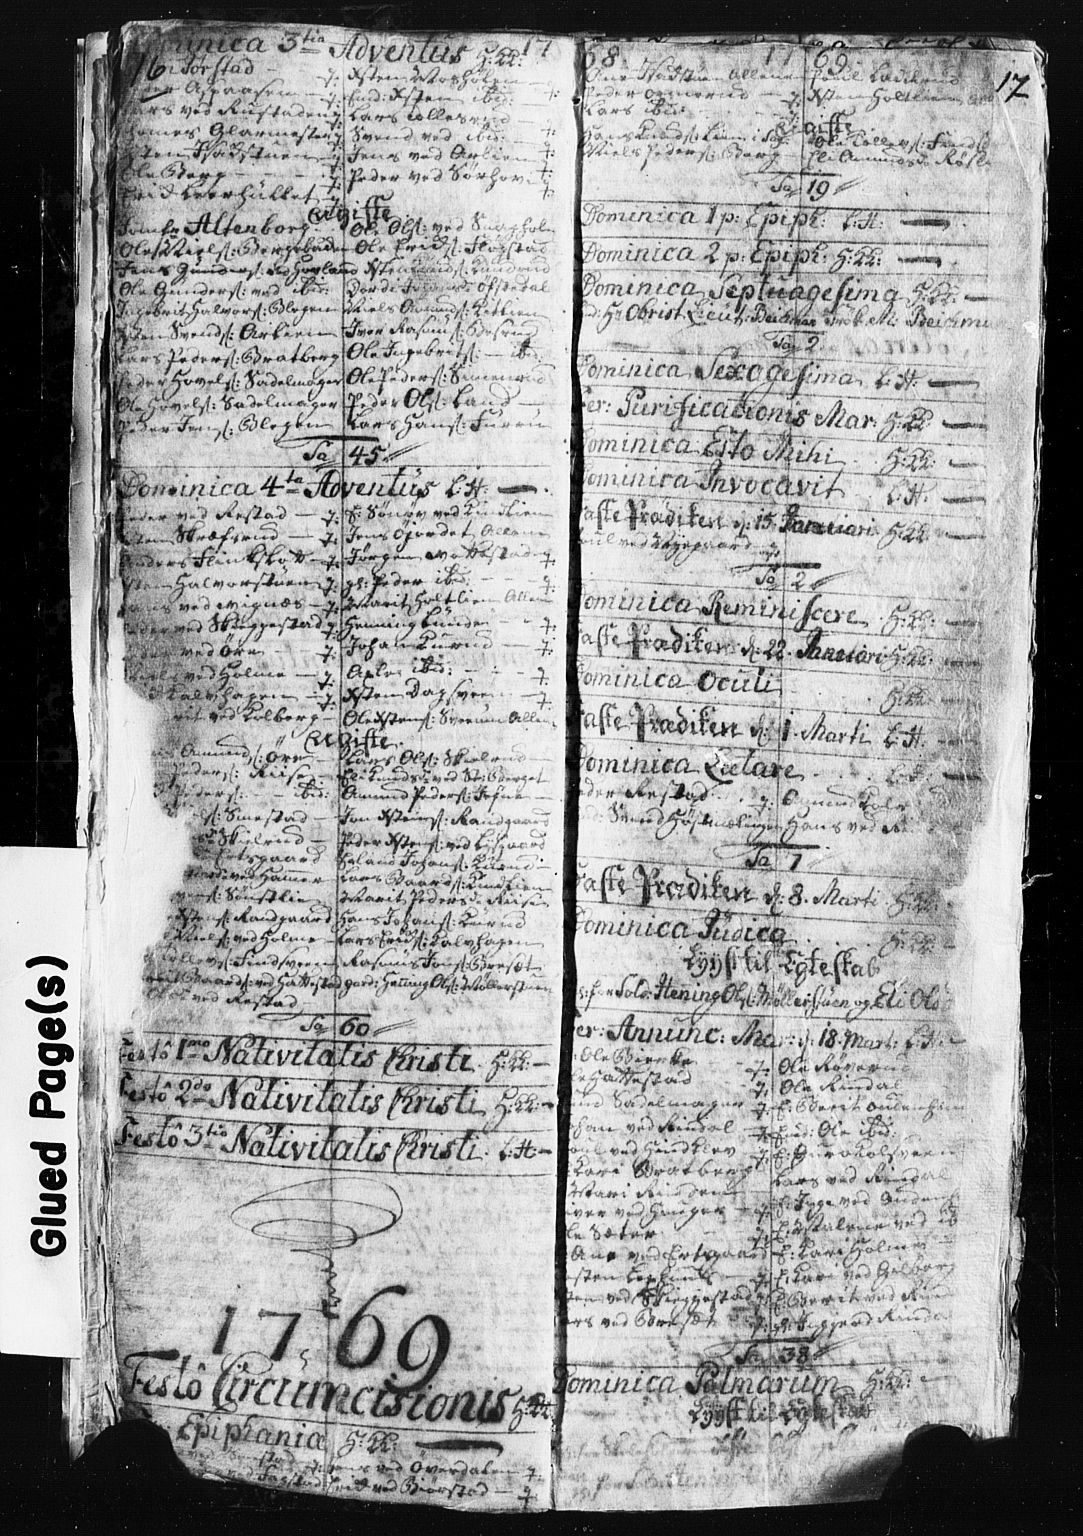 SAH, Fåberg prestekontor, Klokkerbok nr. 3, 1768-1796, s. 16-17